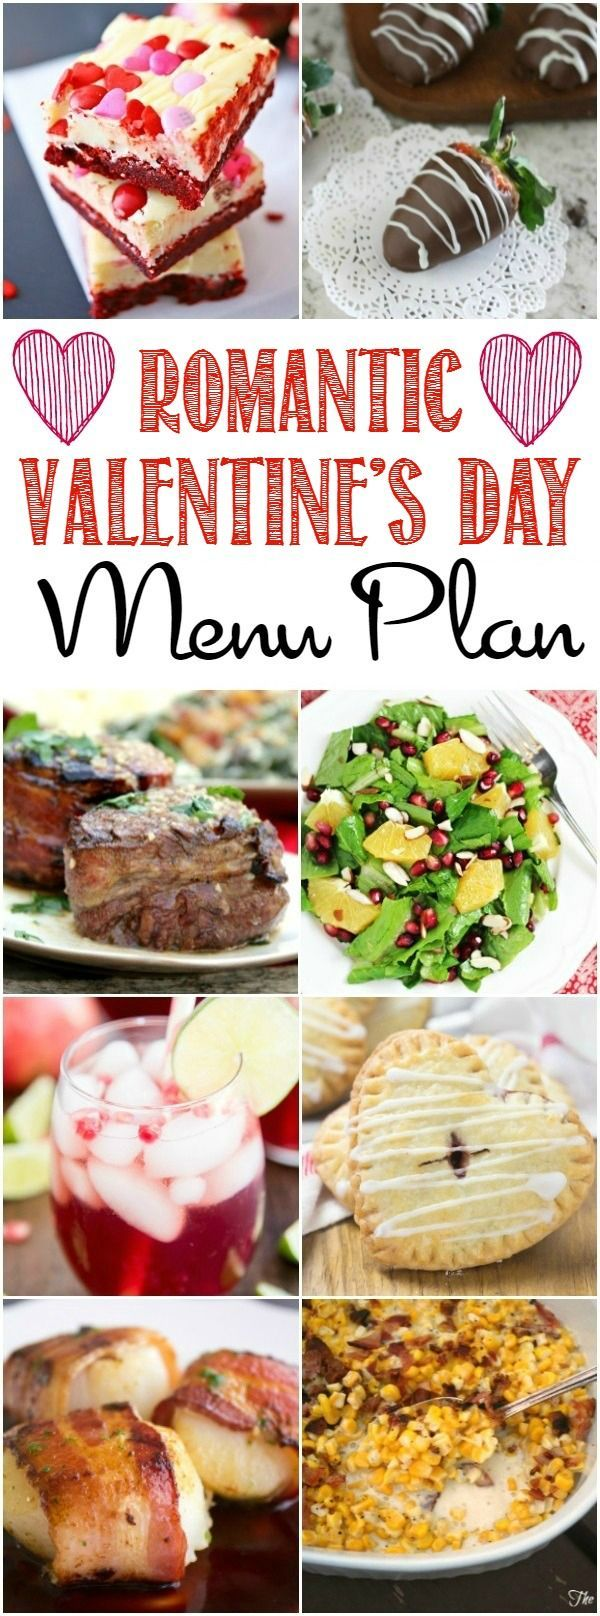 Romantic Valentine S Day Menu Plan 14 Easy Recipes